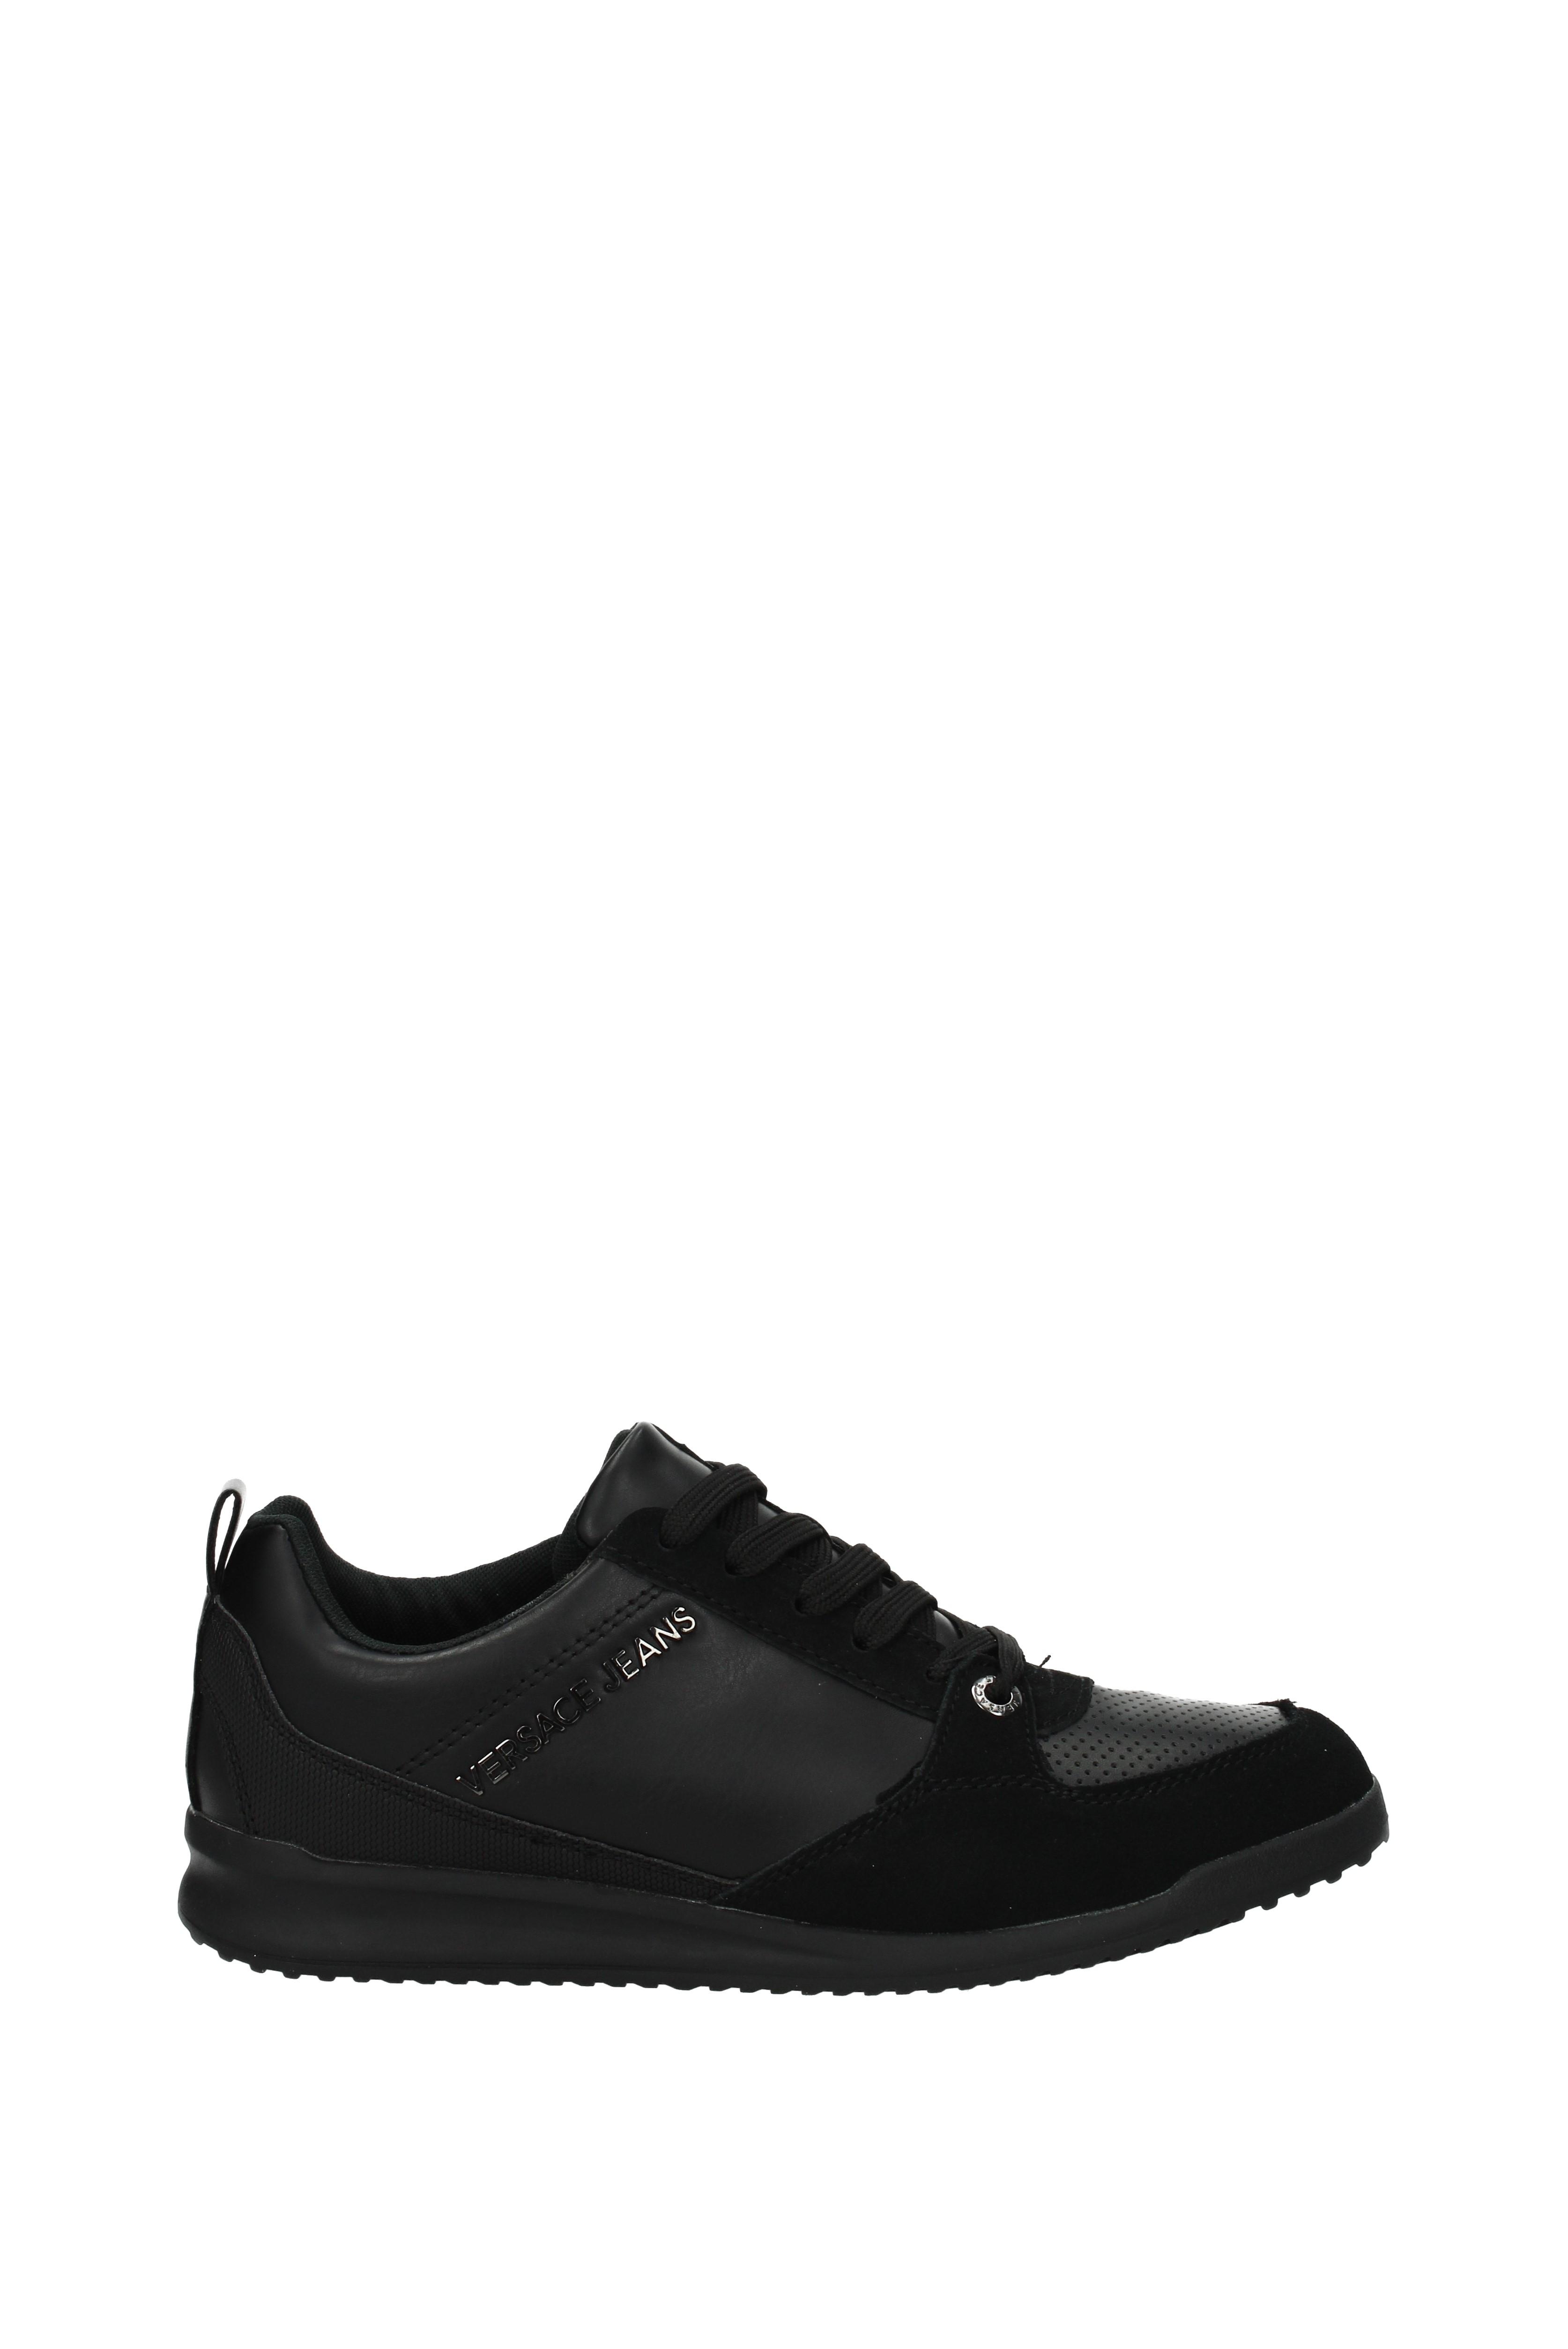 Sneakers Leder Versace Jeans Herren - Leder Sneakers (E0YRBSC470105) f9d242